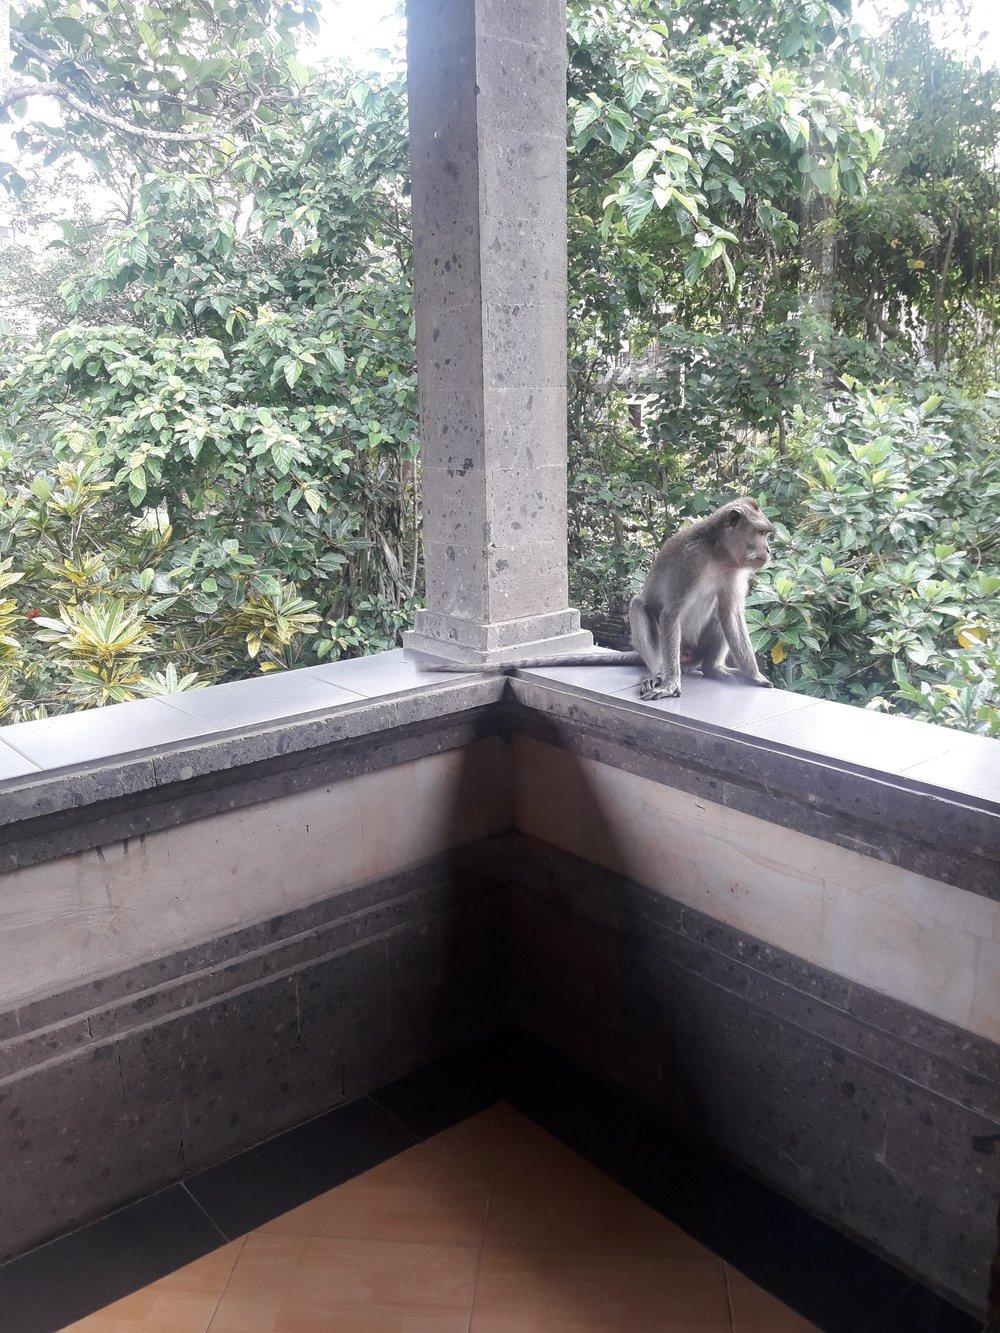 Nosso visitante.